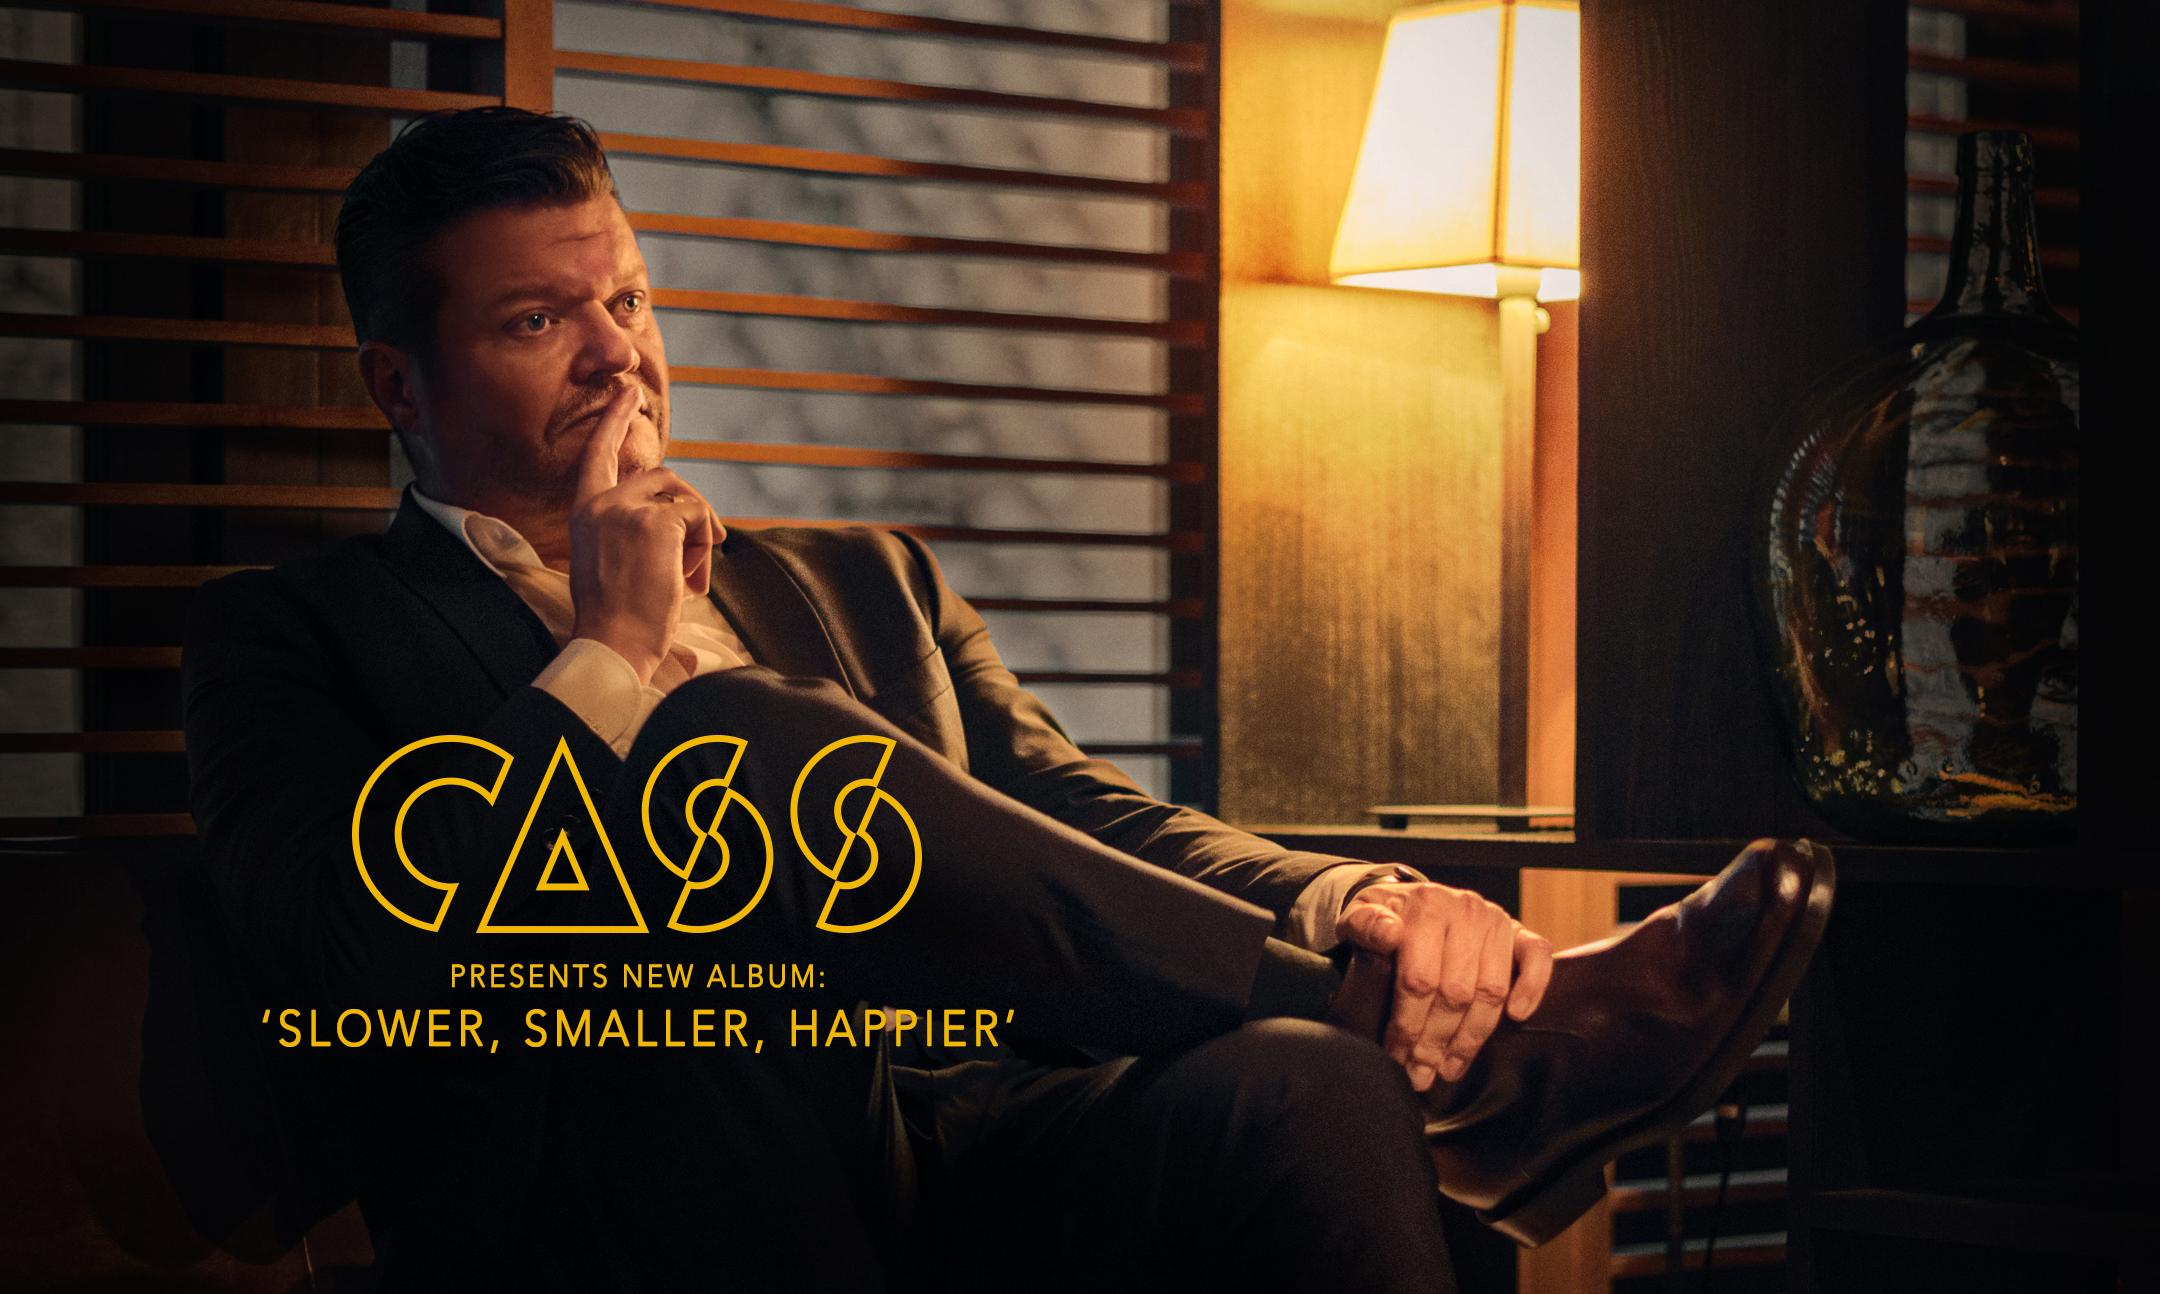 CASS - Slower, Smaller, Happier - Album Launc